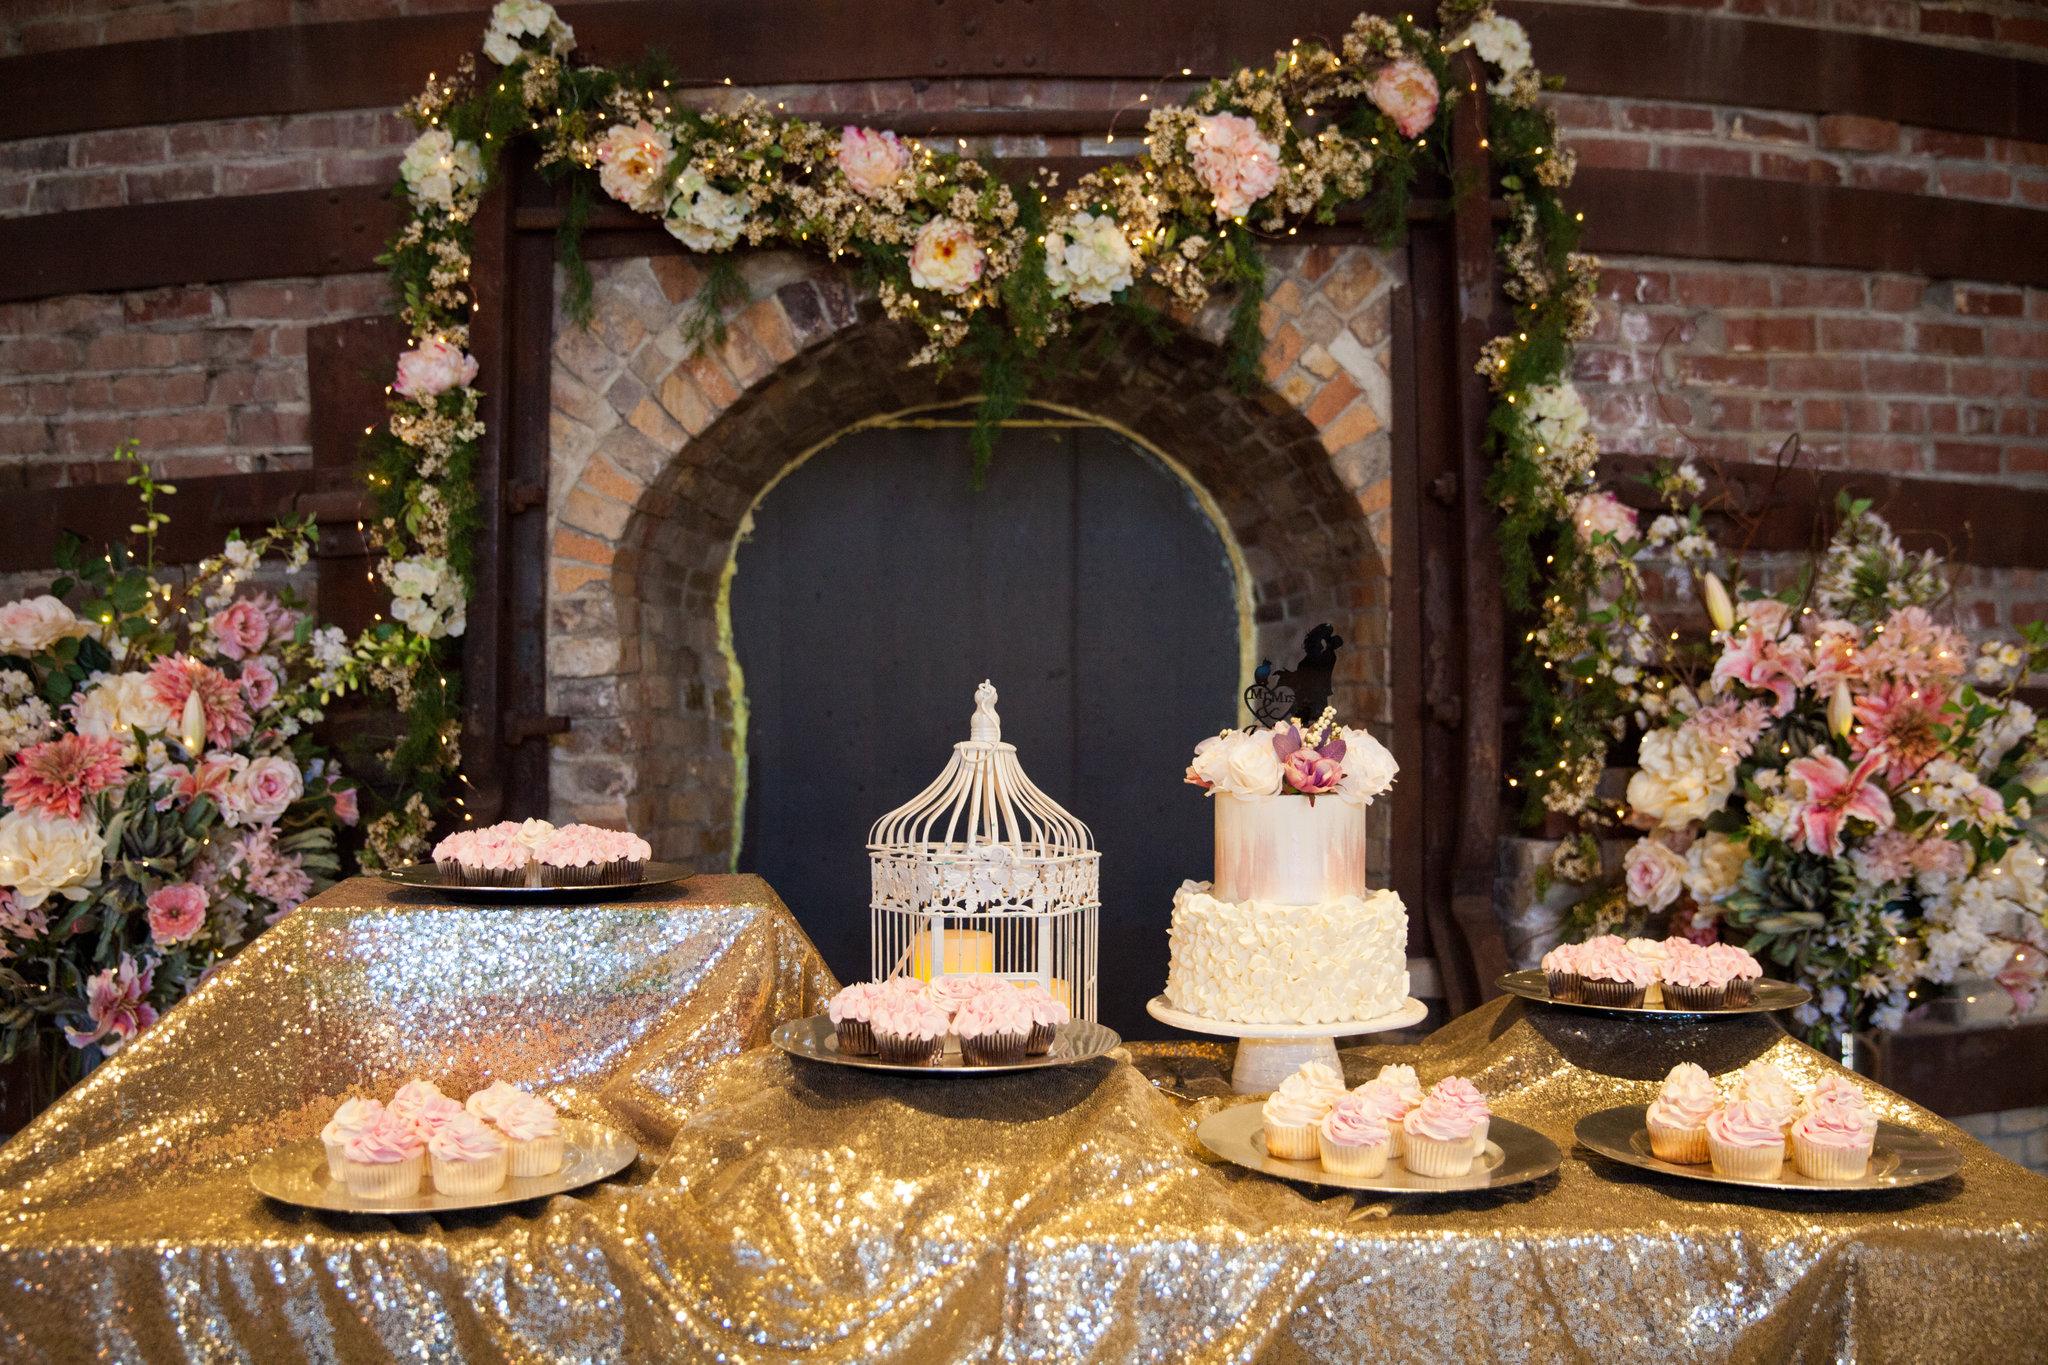 Chasing Autumn Photography - Medicine Hat Photography, Medicine Hat Wedding Photographers, Medalta Potteries, Medalta Wedding, Fun wedding photos, alberta wedding photographer